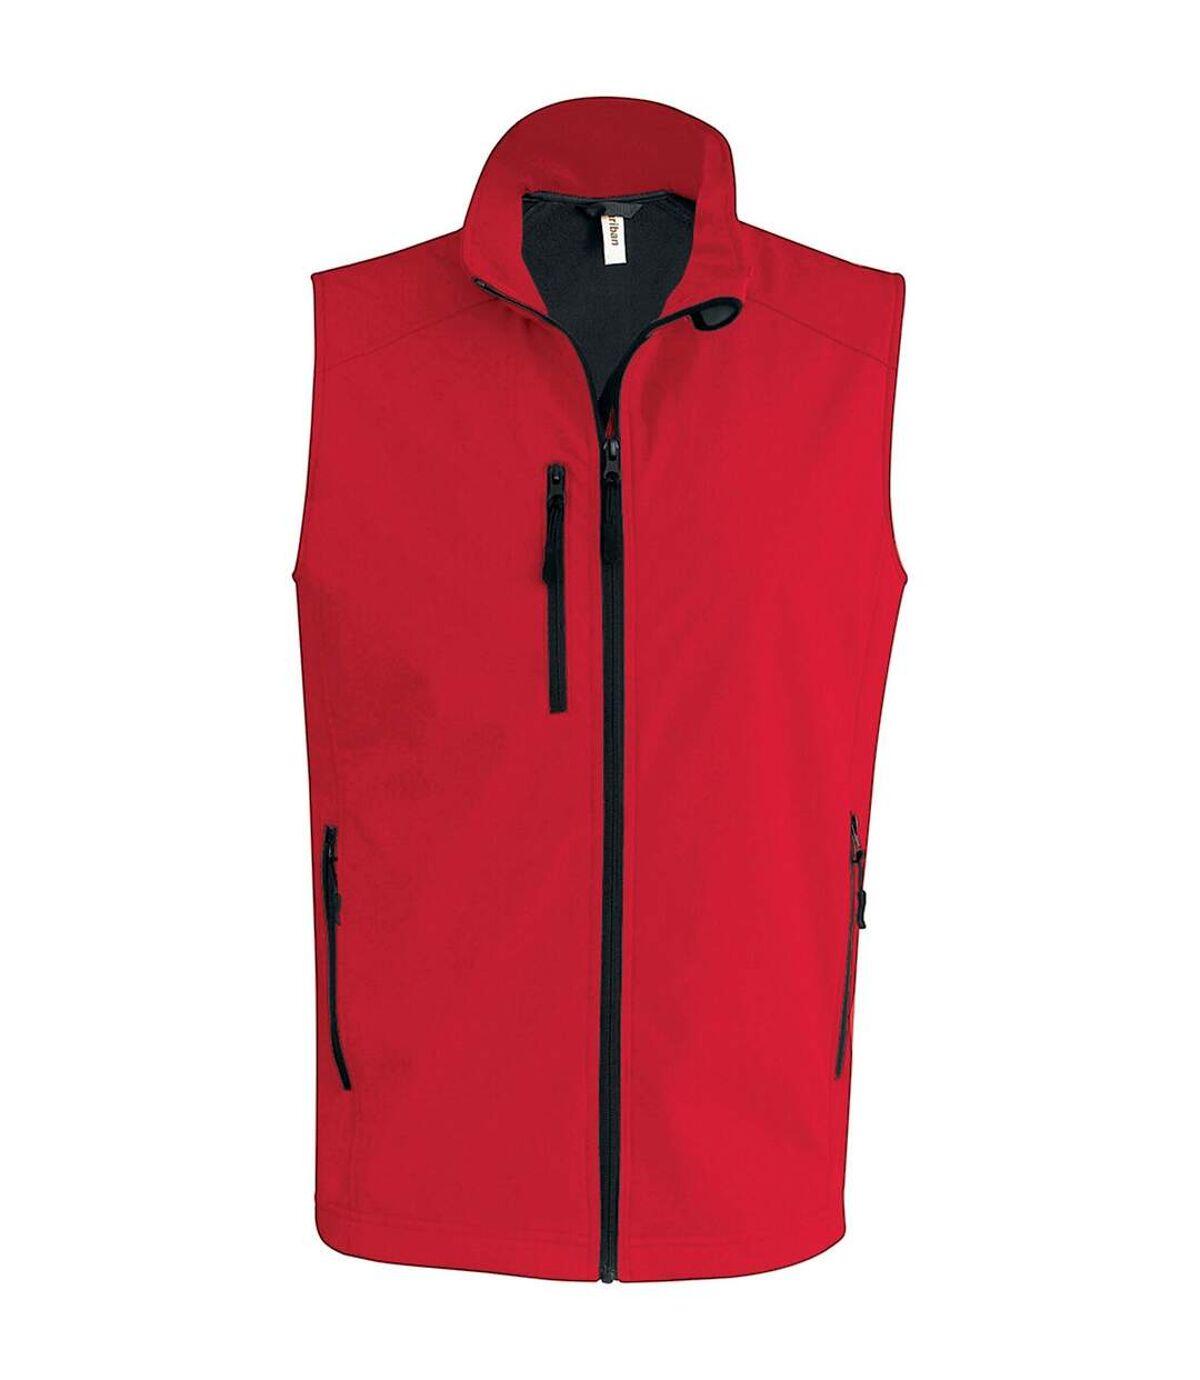 Kariban Mens Quilted Lightweight Down Bodywarmer (Red) - UTPC2667